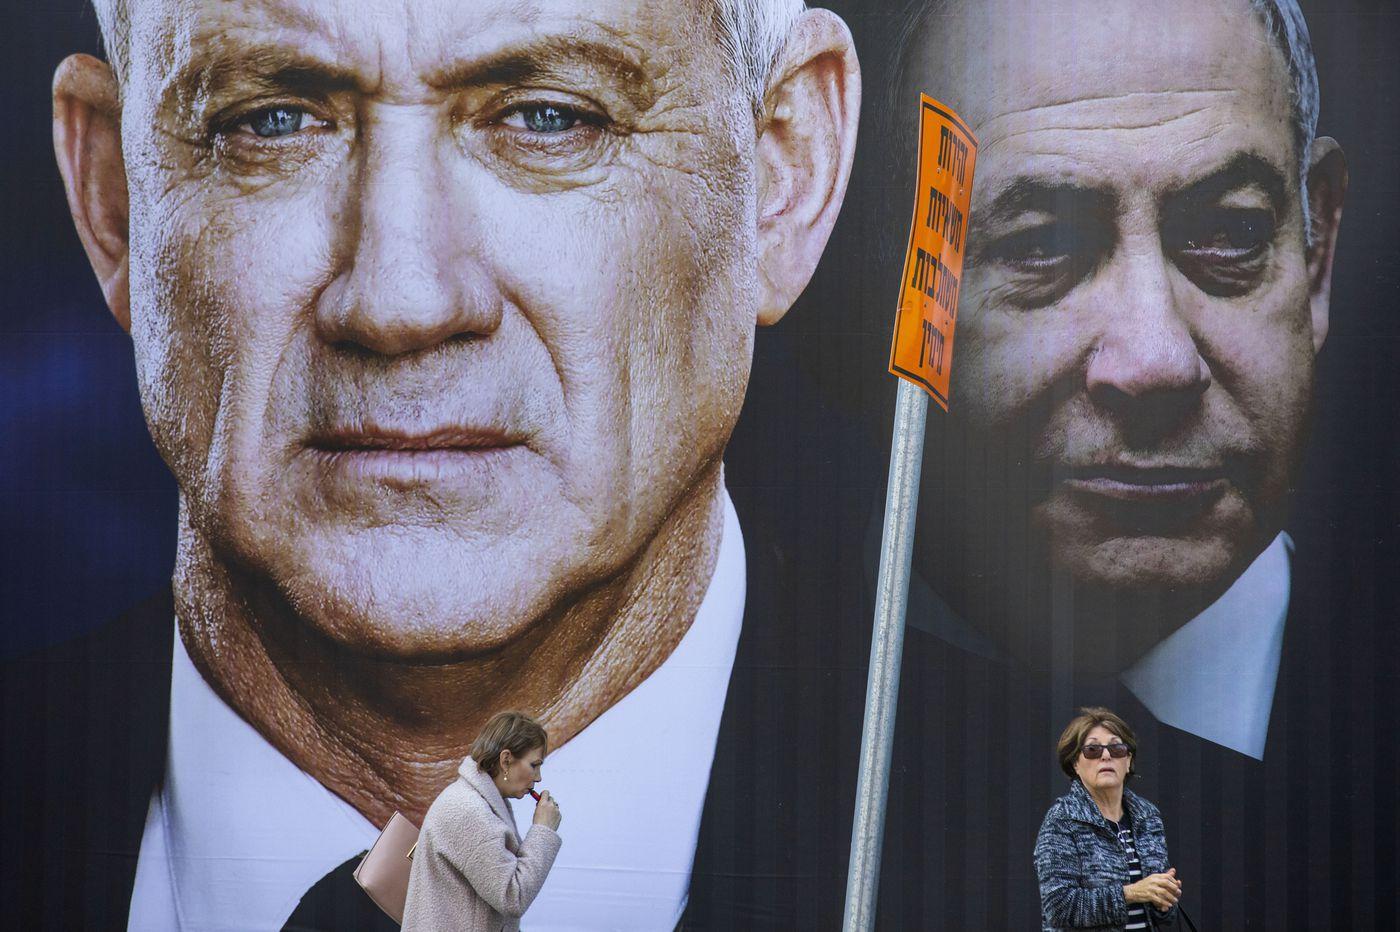 Will coronavirus undermine democracies? Consider Israel, Hungary, and the U.S. | Trudy Rubin